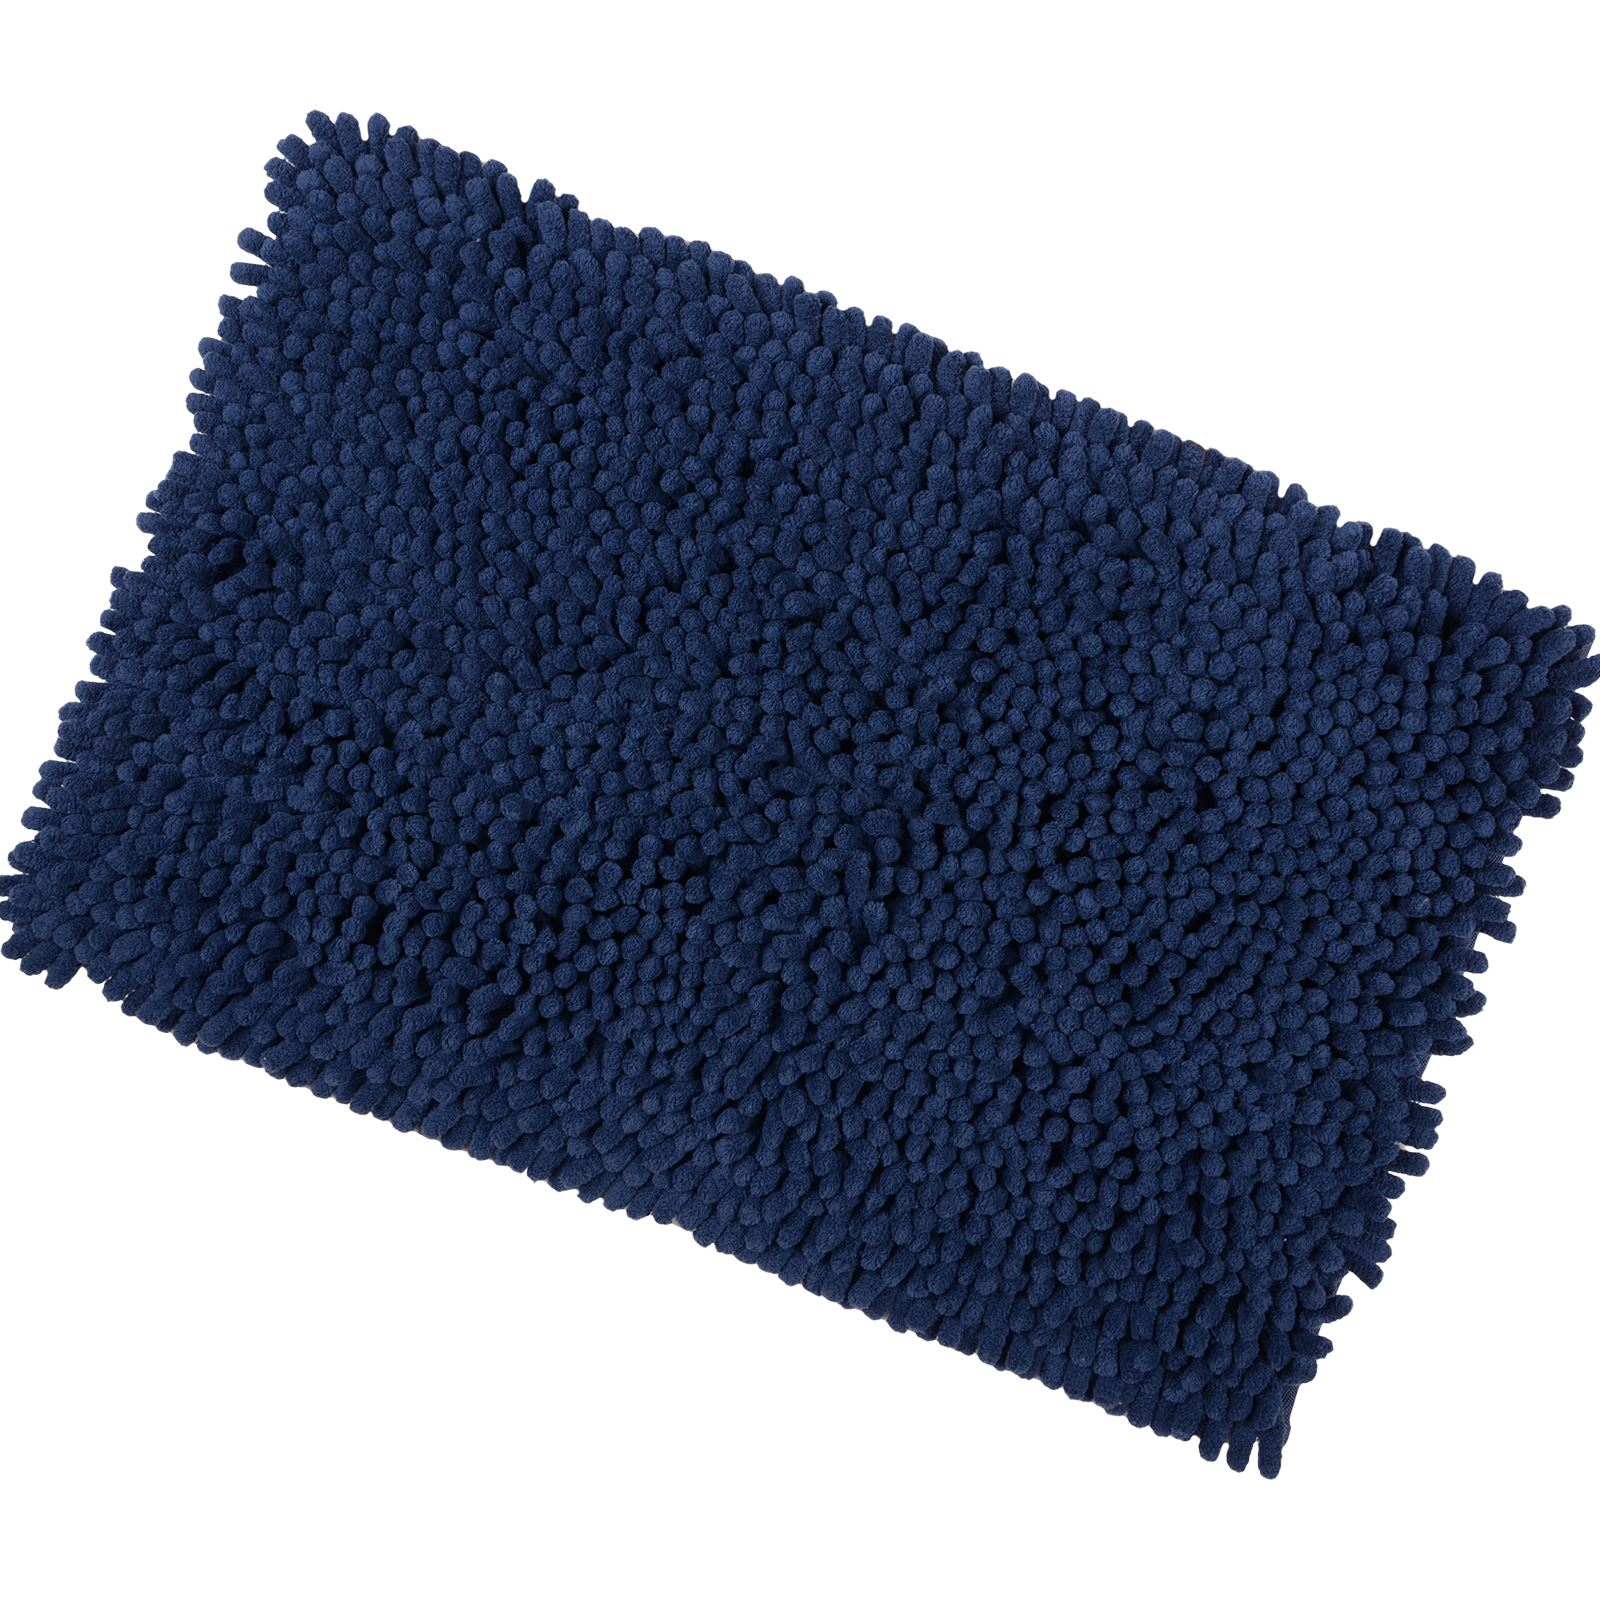 Shaggy Microfibre Bathroom Shower Bath Mat Rug Non Slip